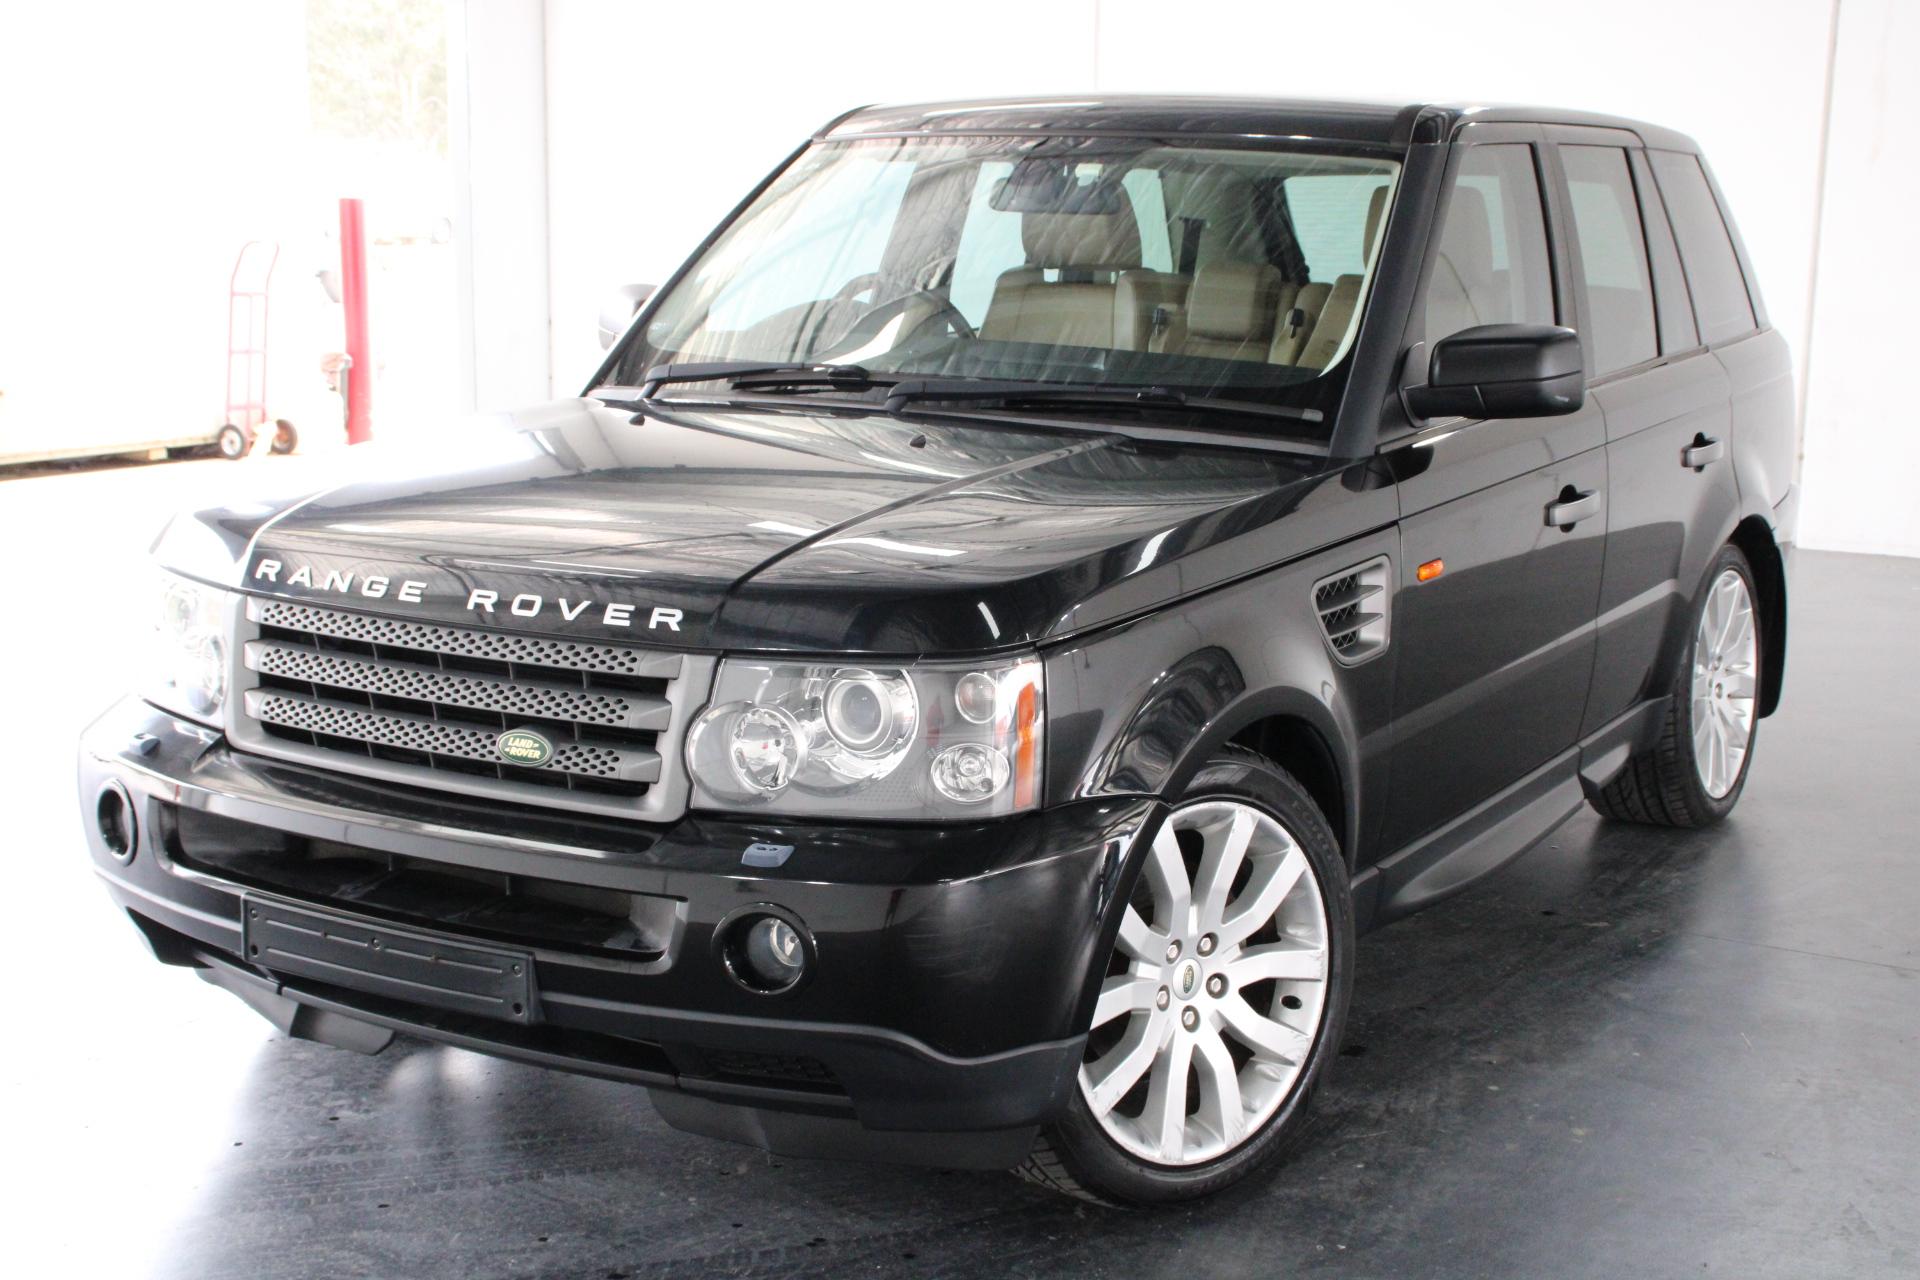 2008 Land Rover Range Rover Sport TDV6 Turbo Diesel Automatic Wagon